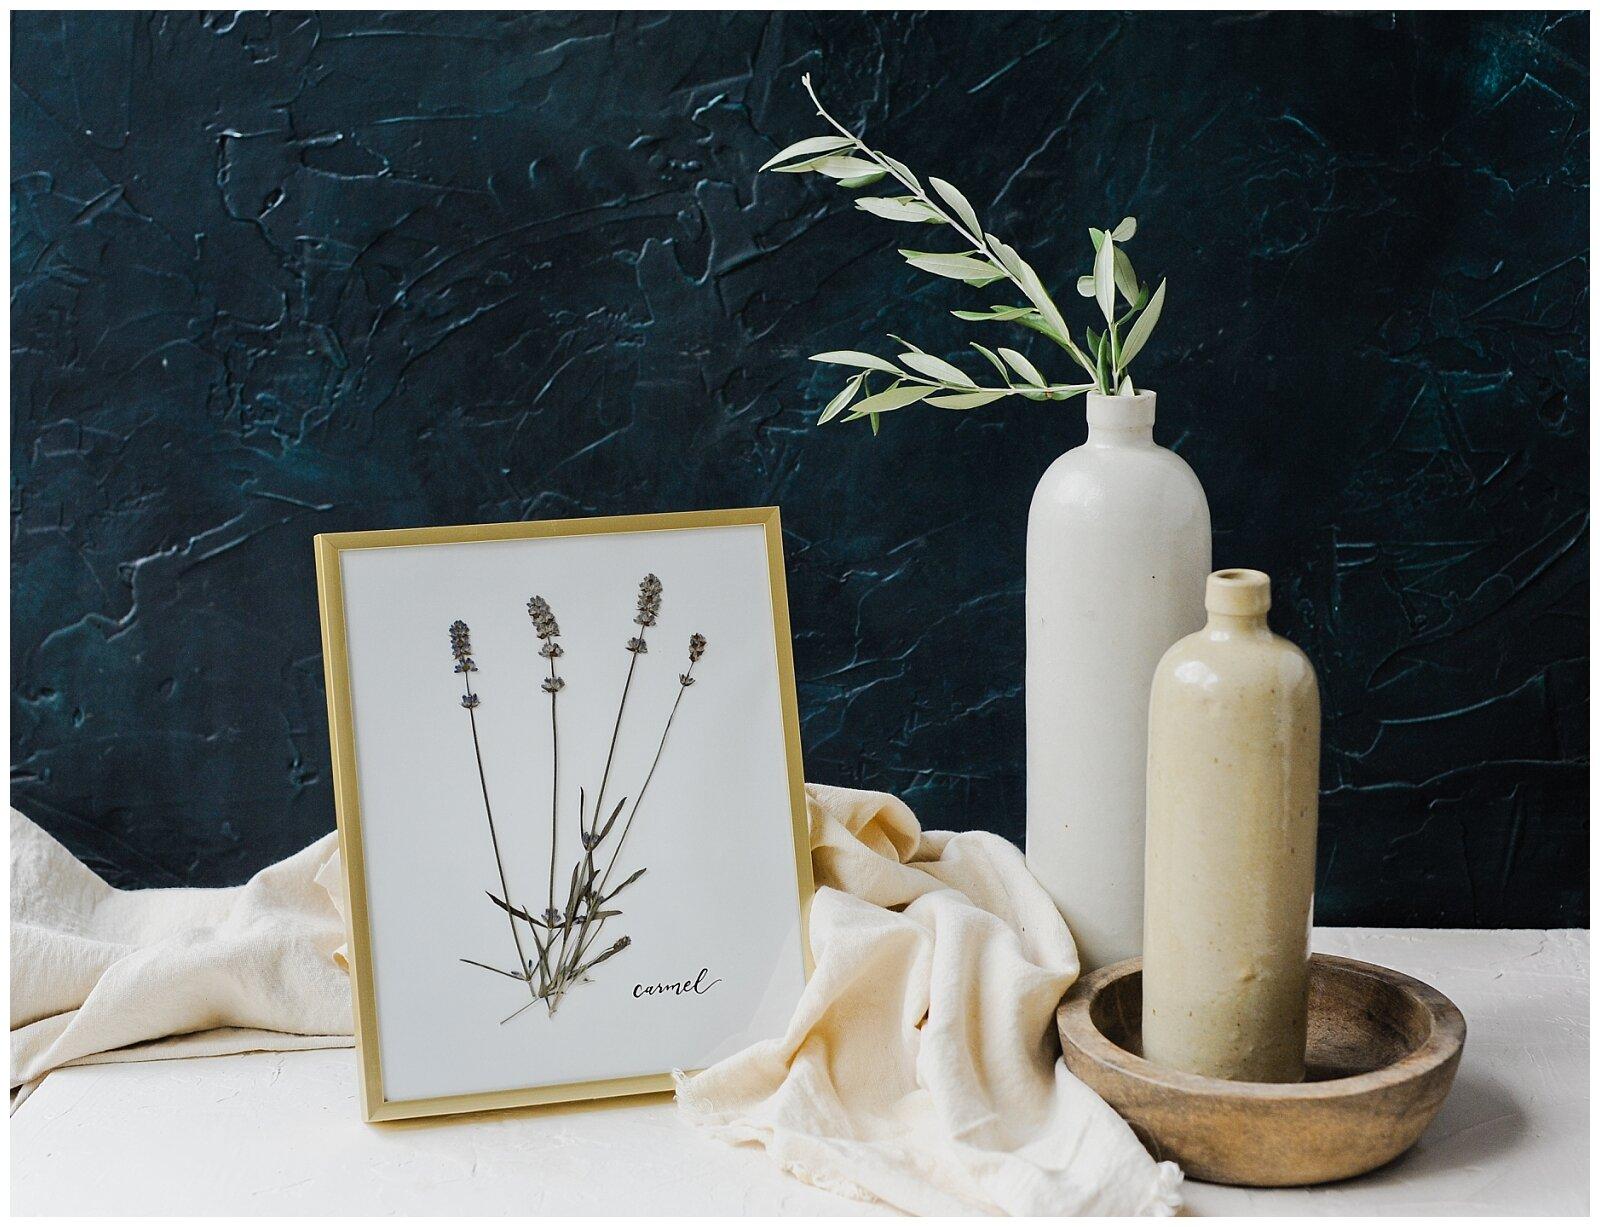 phoenix-feathers-calligraphy-pressed-flowers.jpg